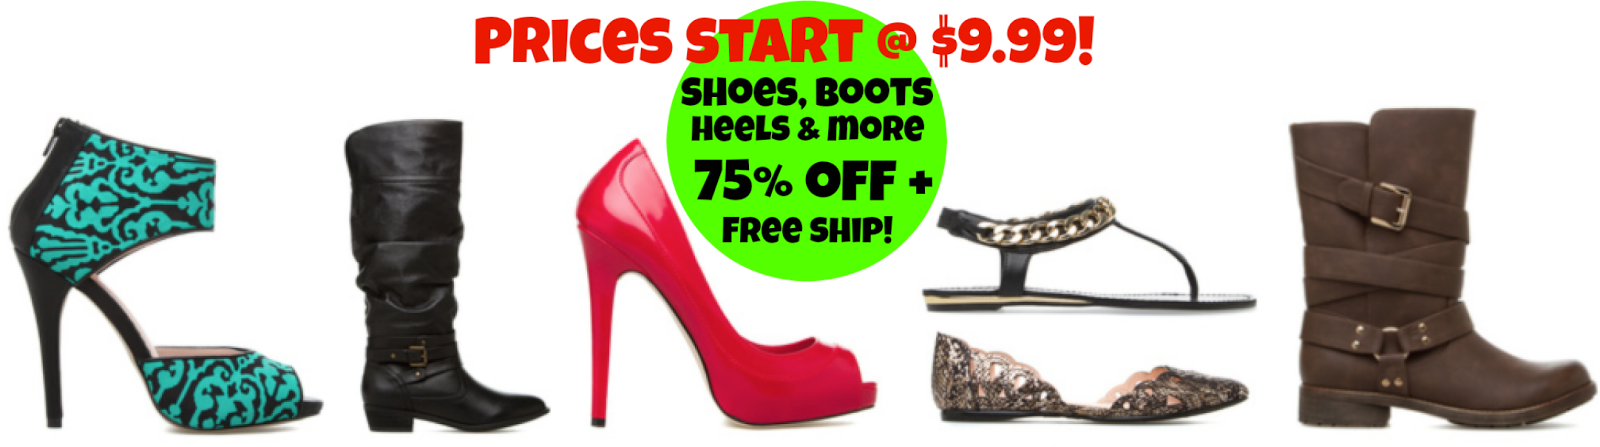 http://www.thebinderladies.com/2014/09/hot-shoedazzle-75-off-boots-heels-shoes.html#.VAkEwkvdtbw